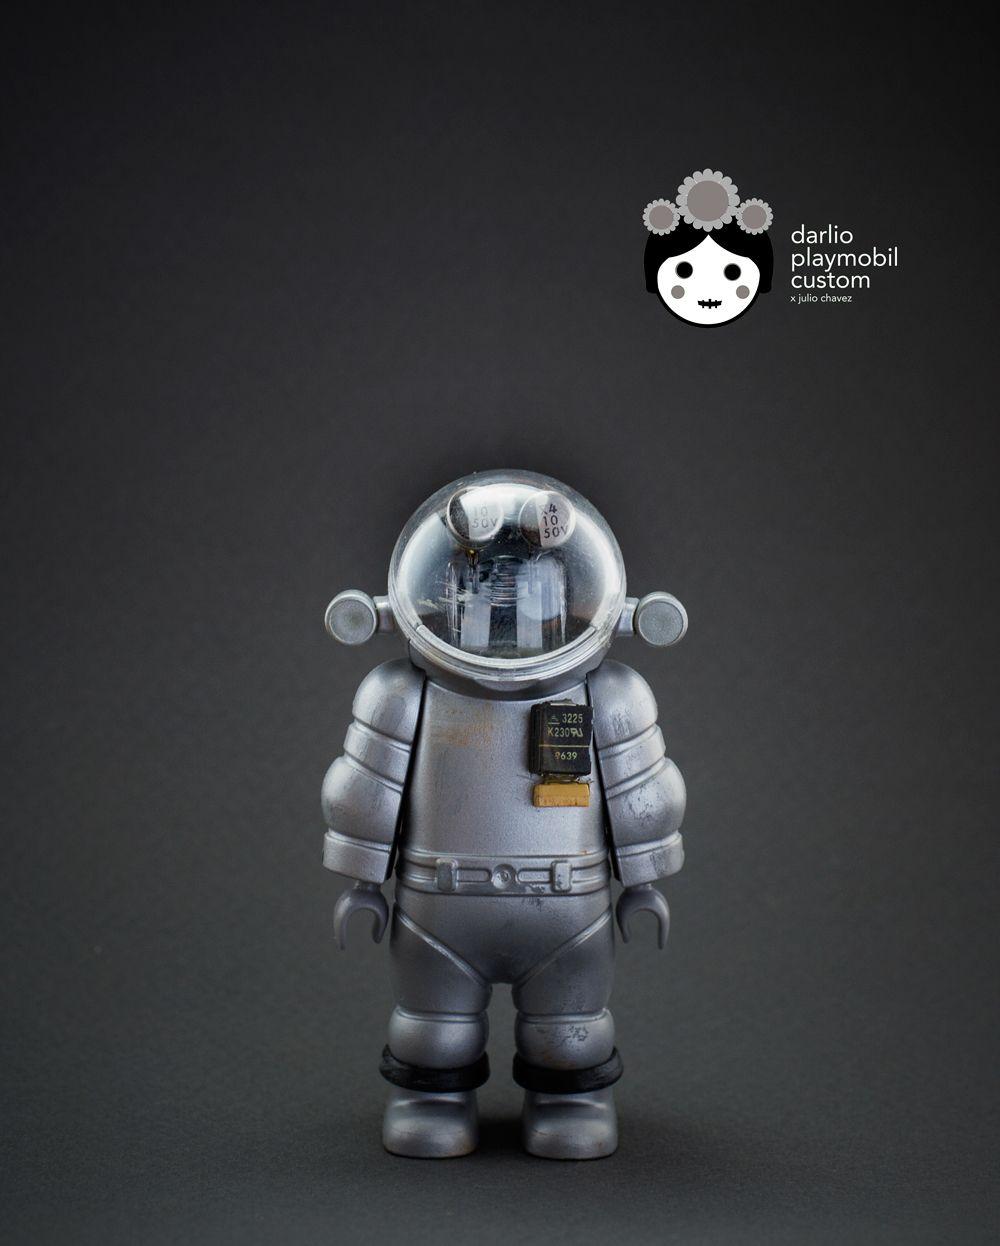 Playmobil Action Ausmalbilder : Robot Playmobil Custom Playmobil Pinterest